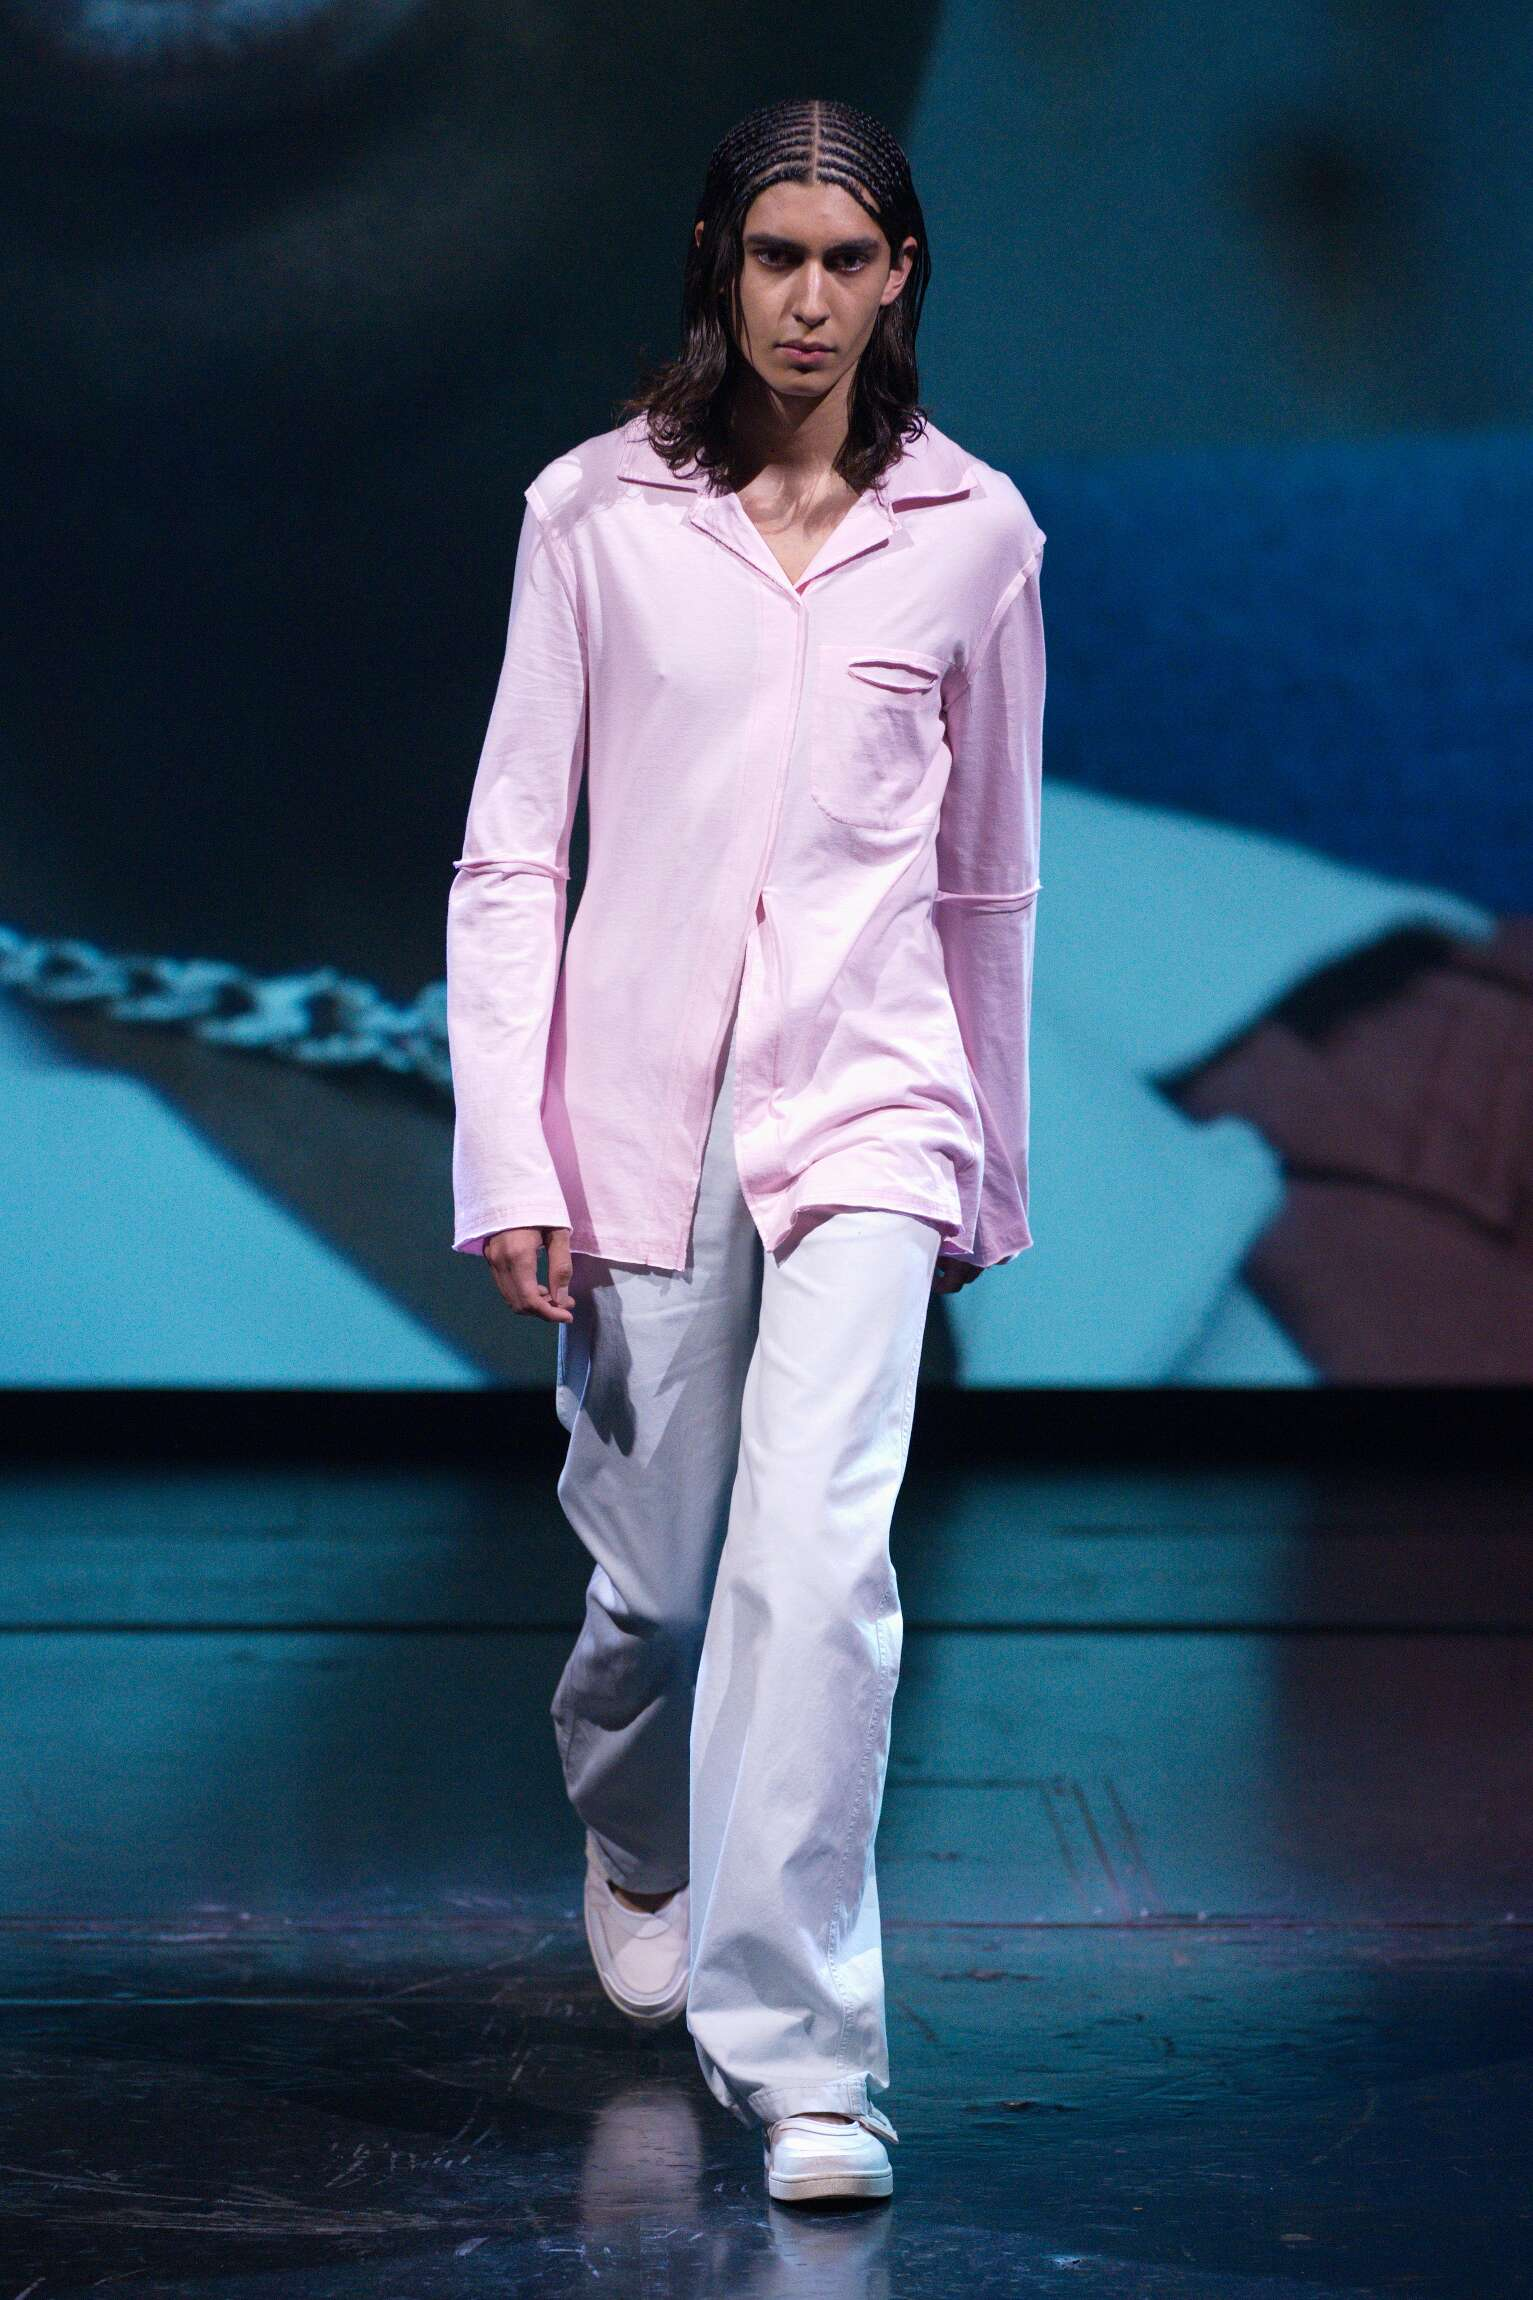 Telfar SS 2020 Menswear